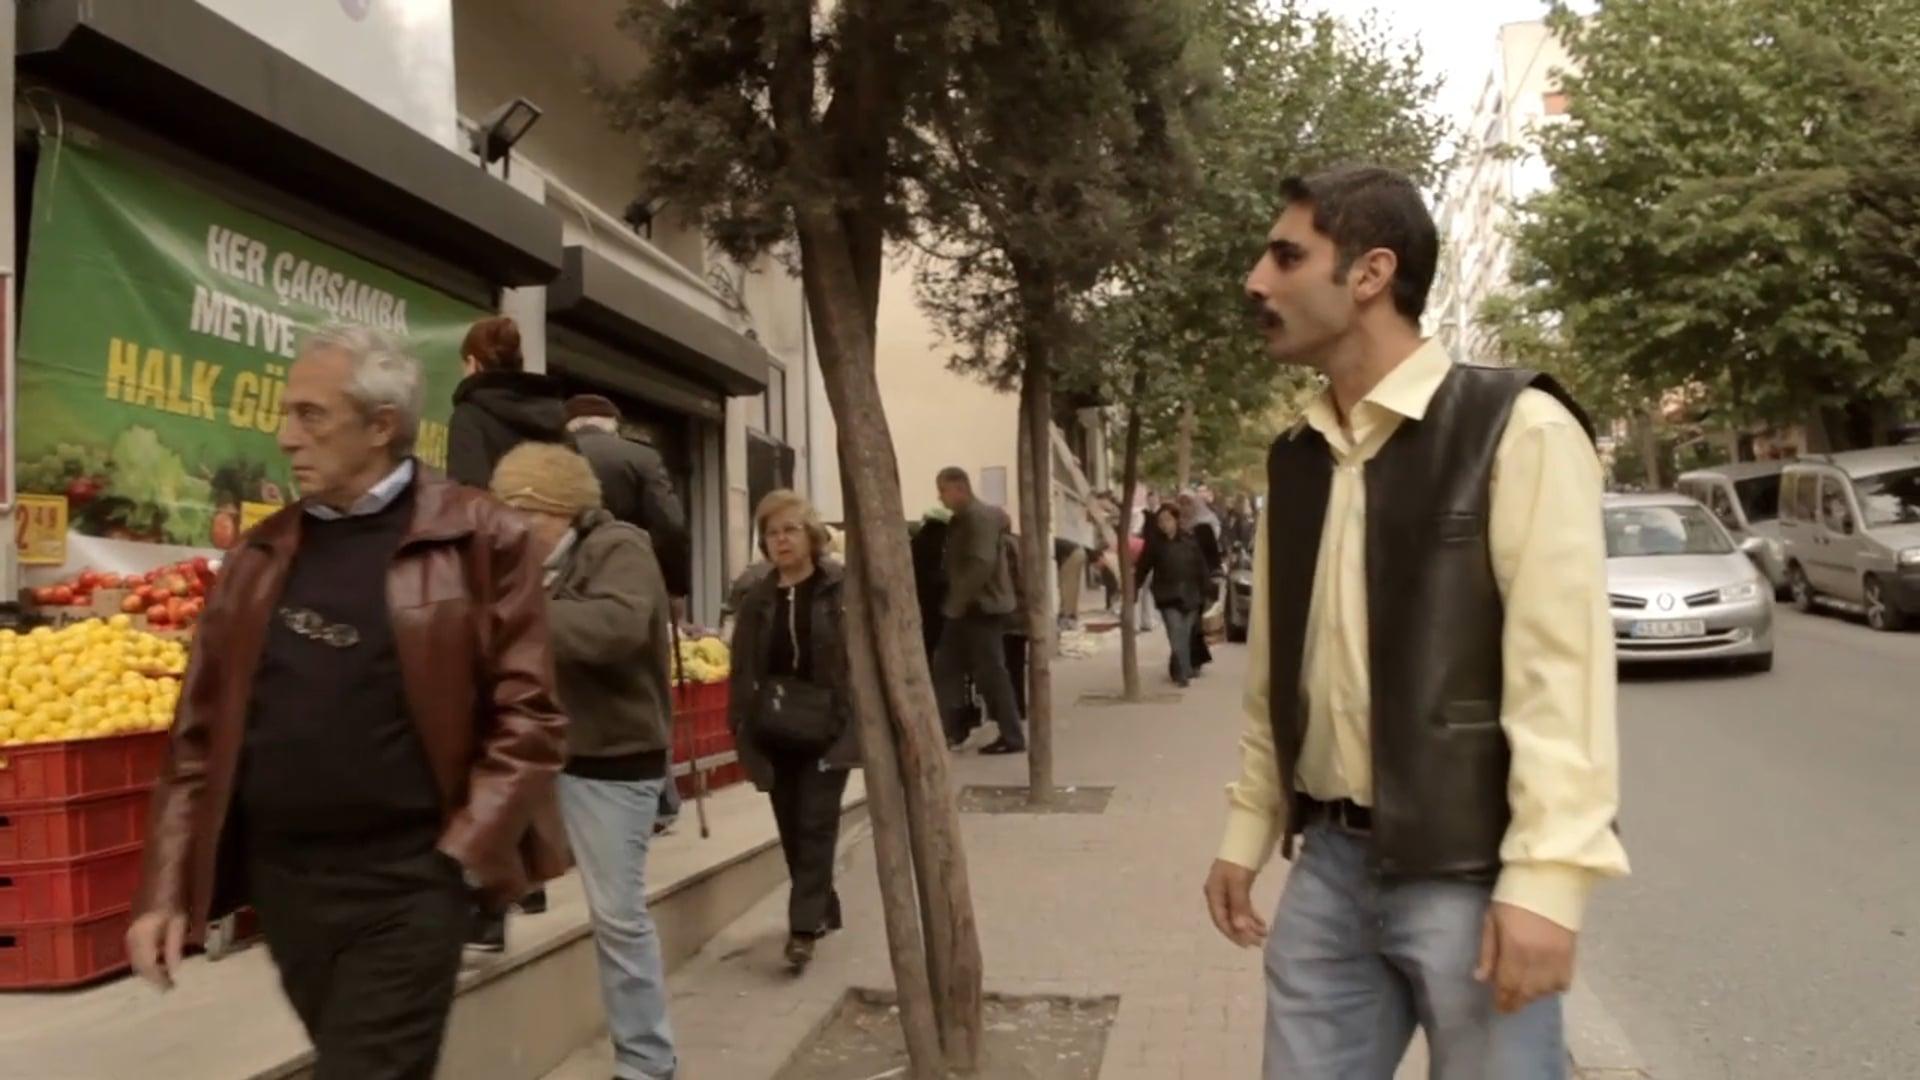 Selcen Ergun - Carrefoursa Tayfur kaderin peşinde interaktif film